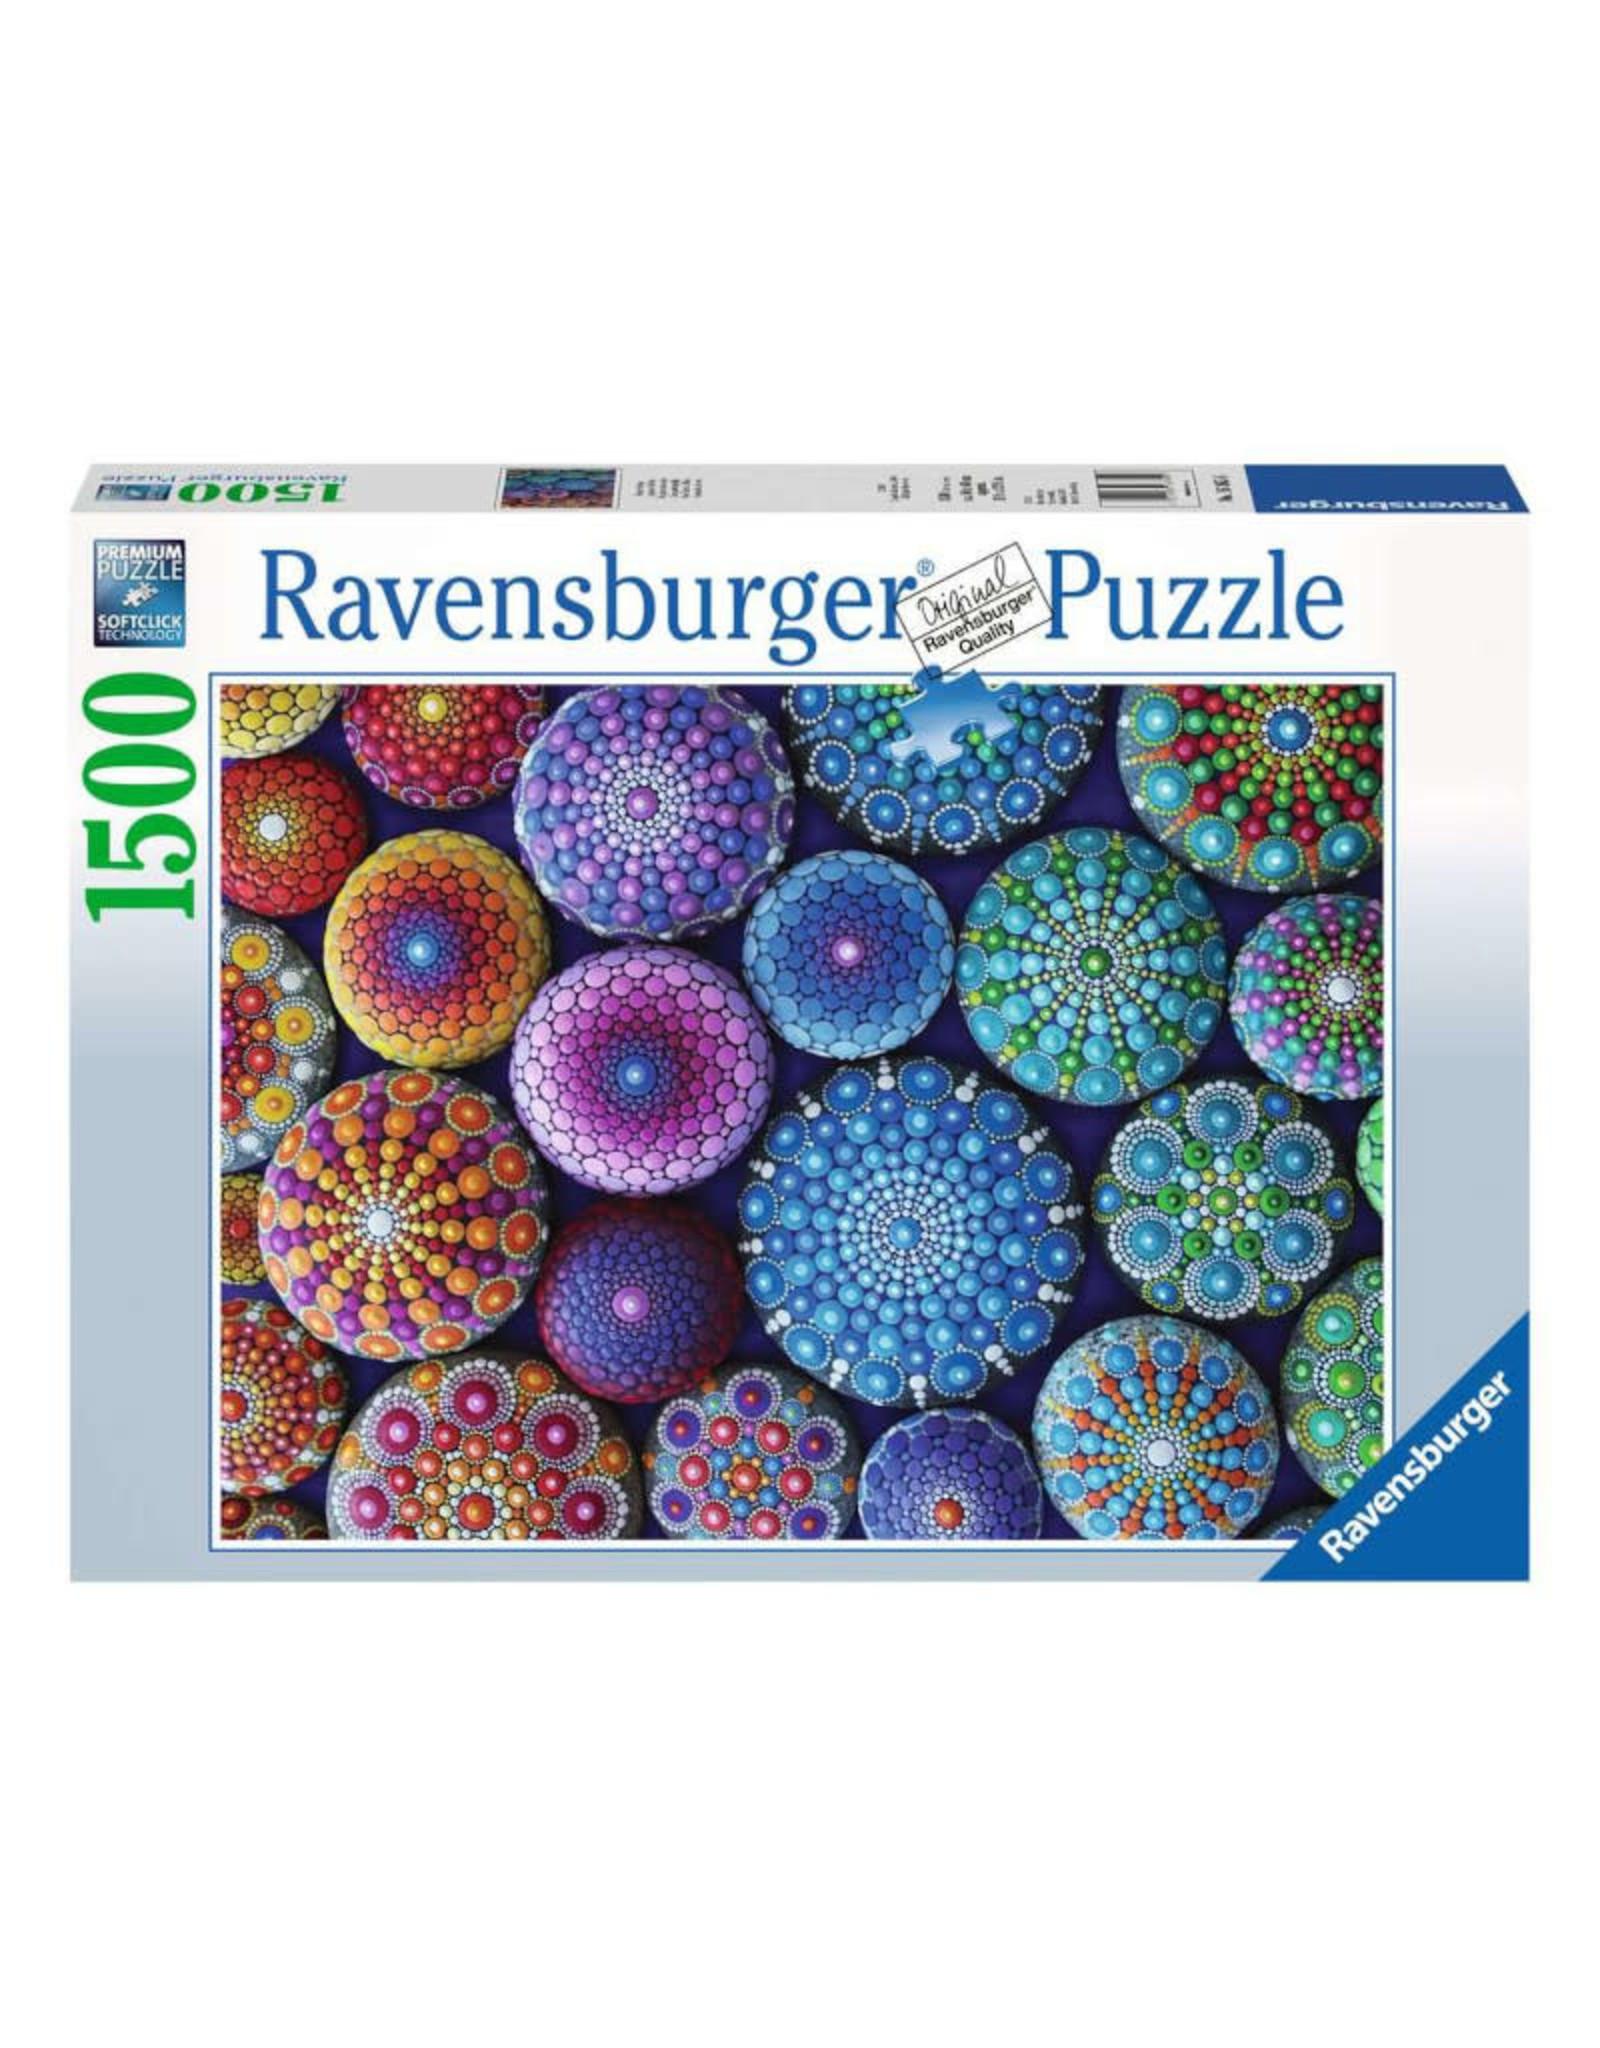 Ravensburger One Dot at a Time Puzzle 1500 PCS